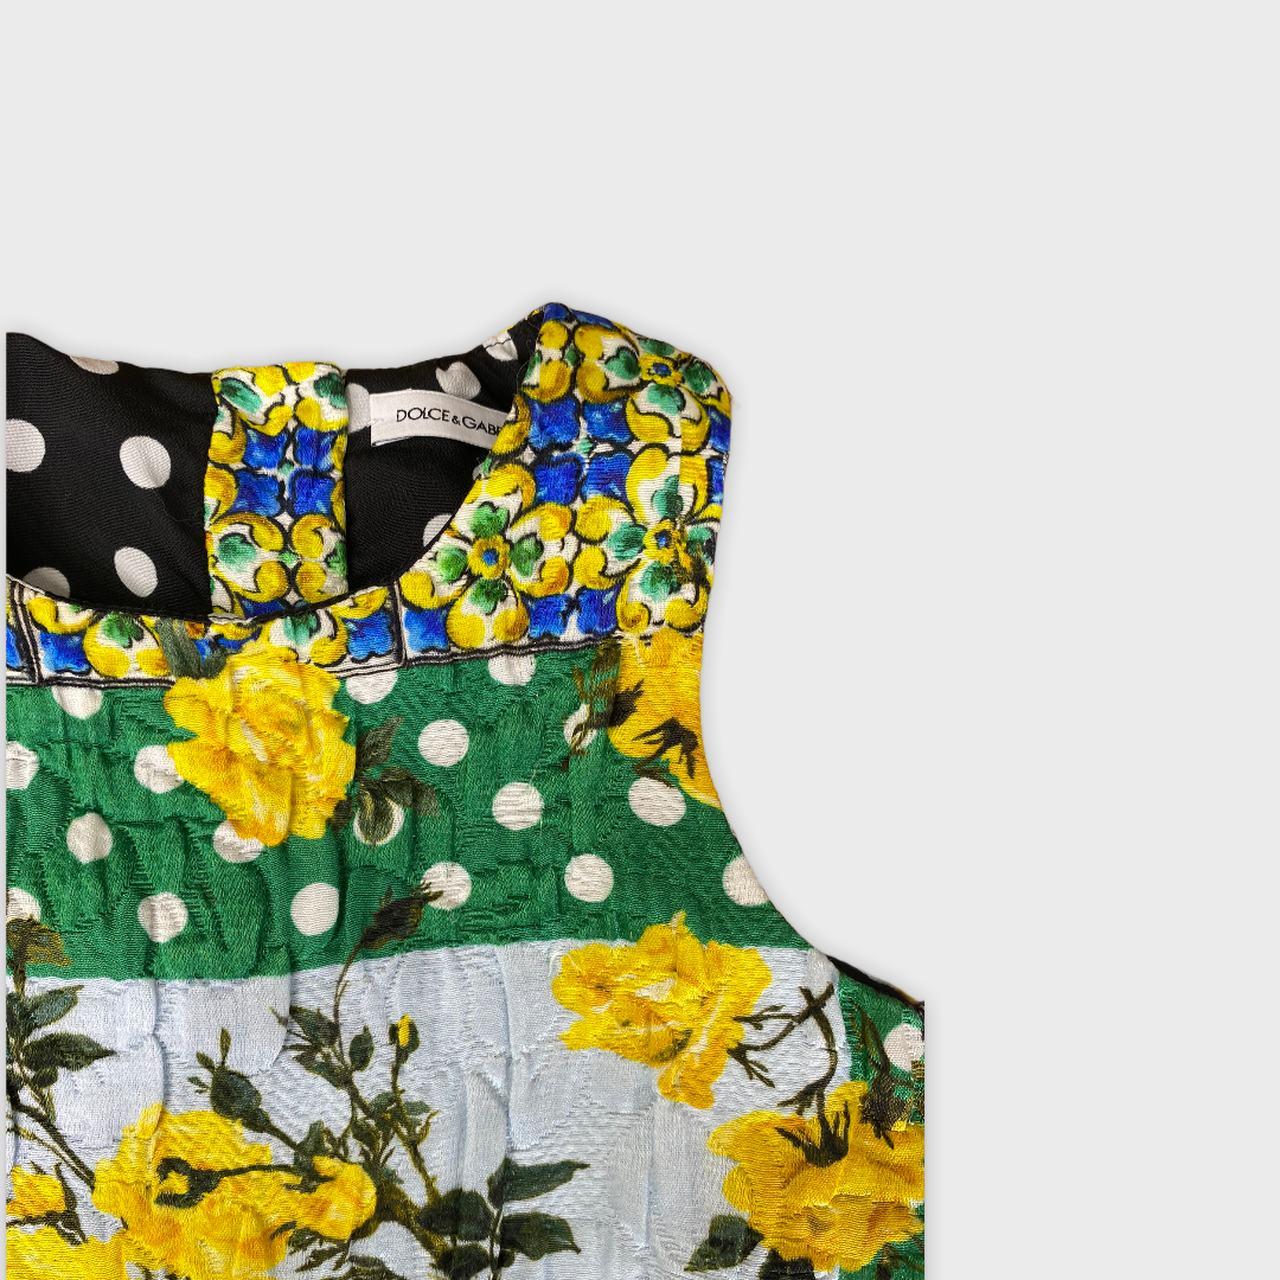 Vestido Dolce & Gabbana 24/30 meses